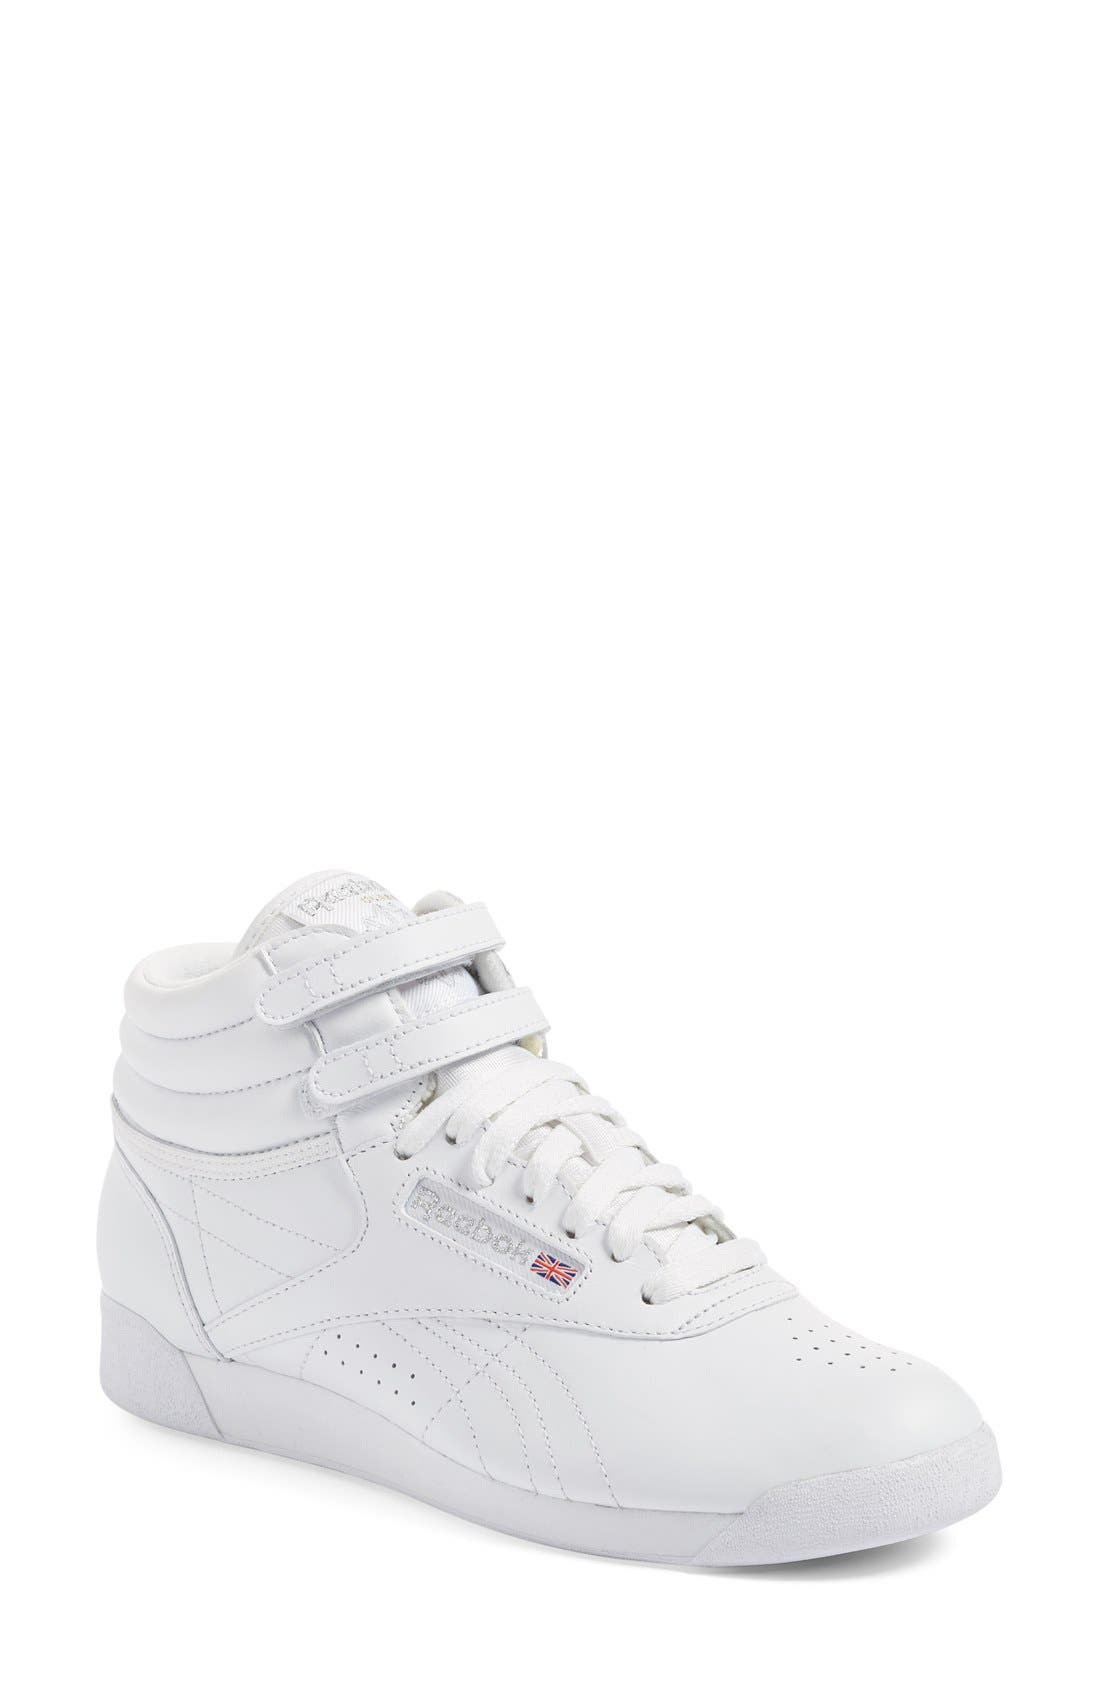 'Freestyle Hi' Sneaker,                         Main,                         color, White/ Silver